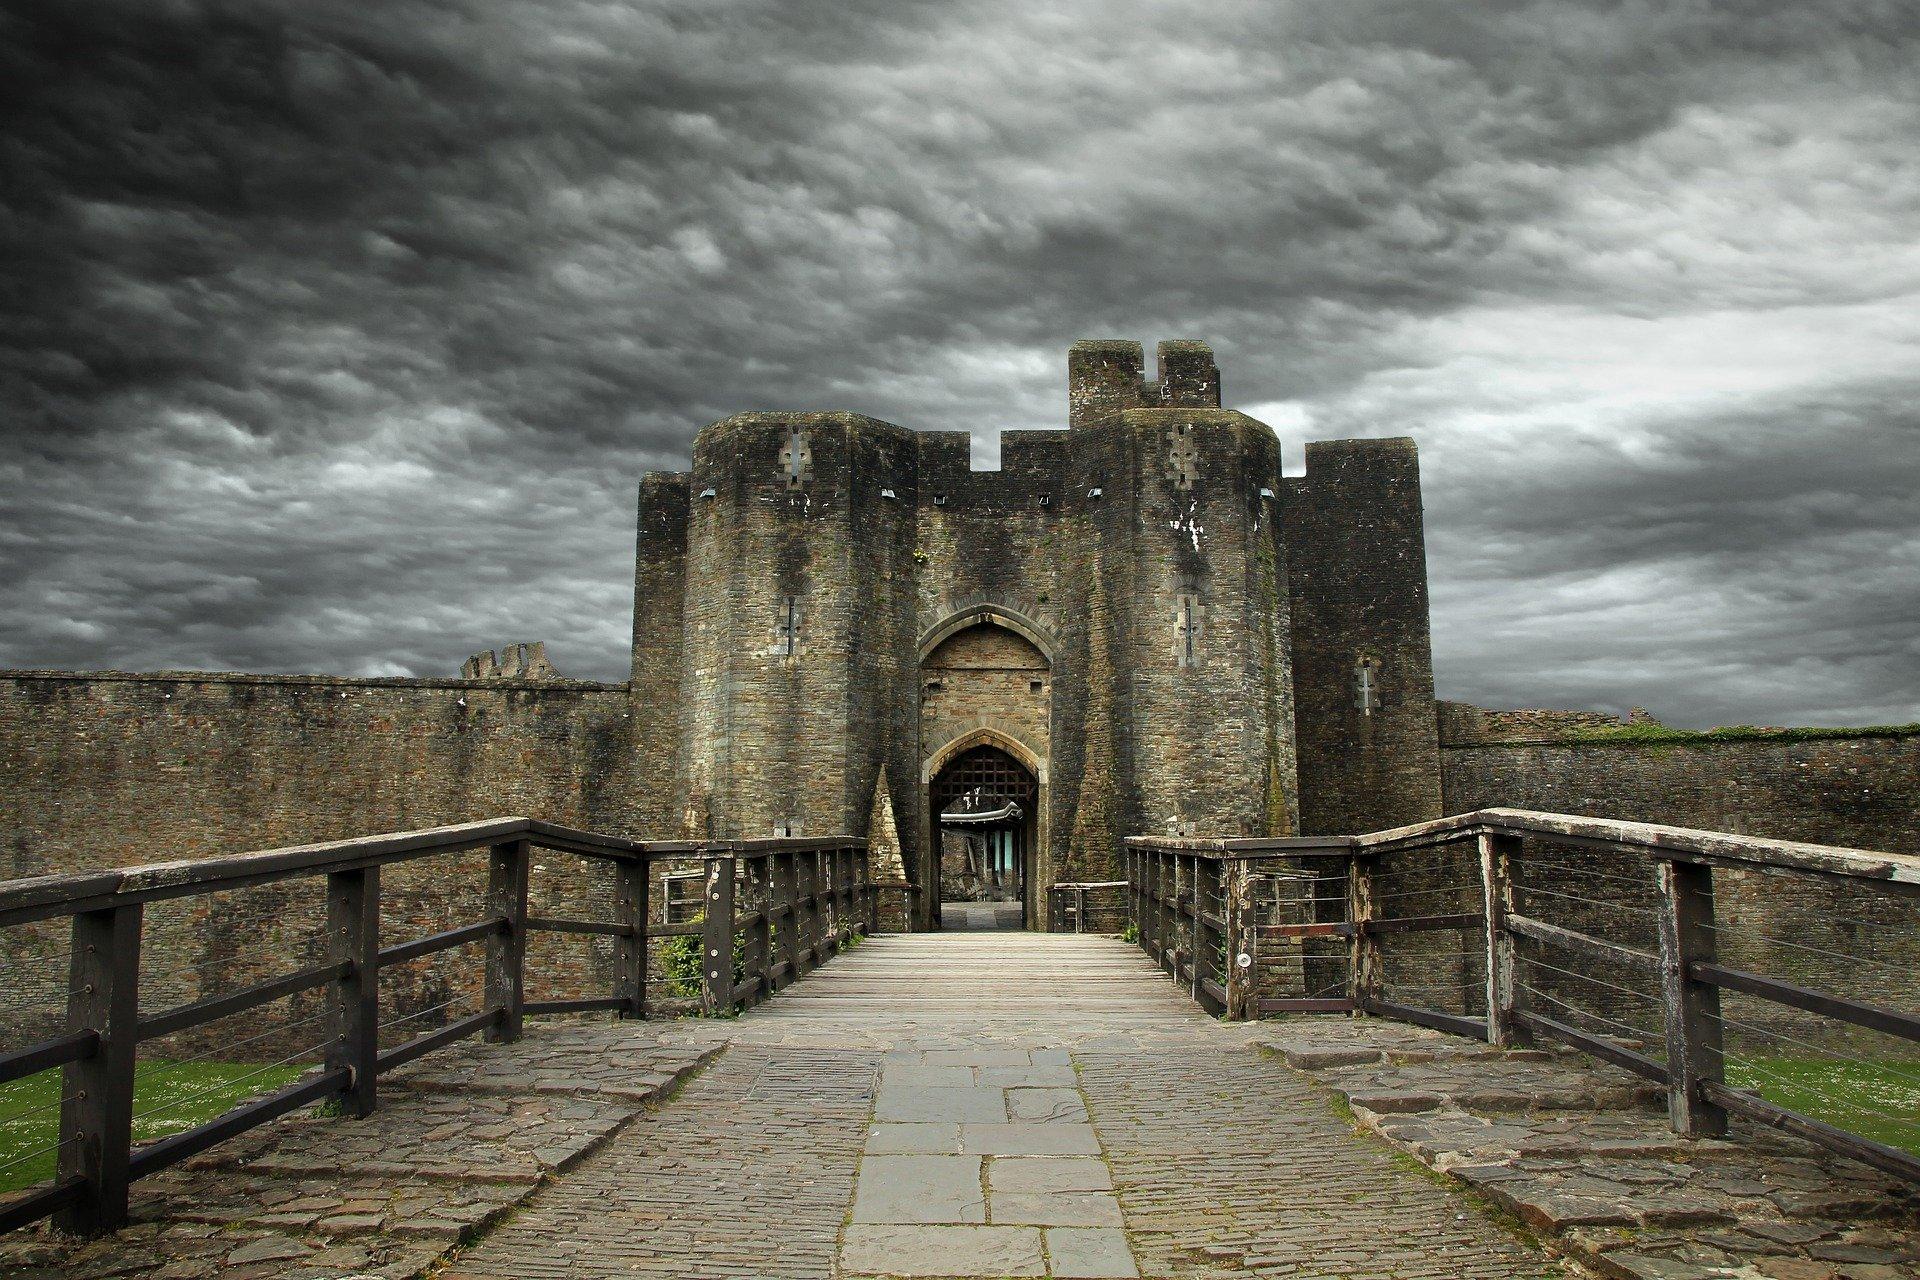 Enjoyable Historical Mystery Treachery By S.J. Parris